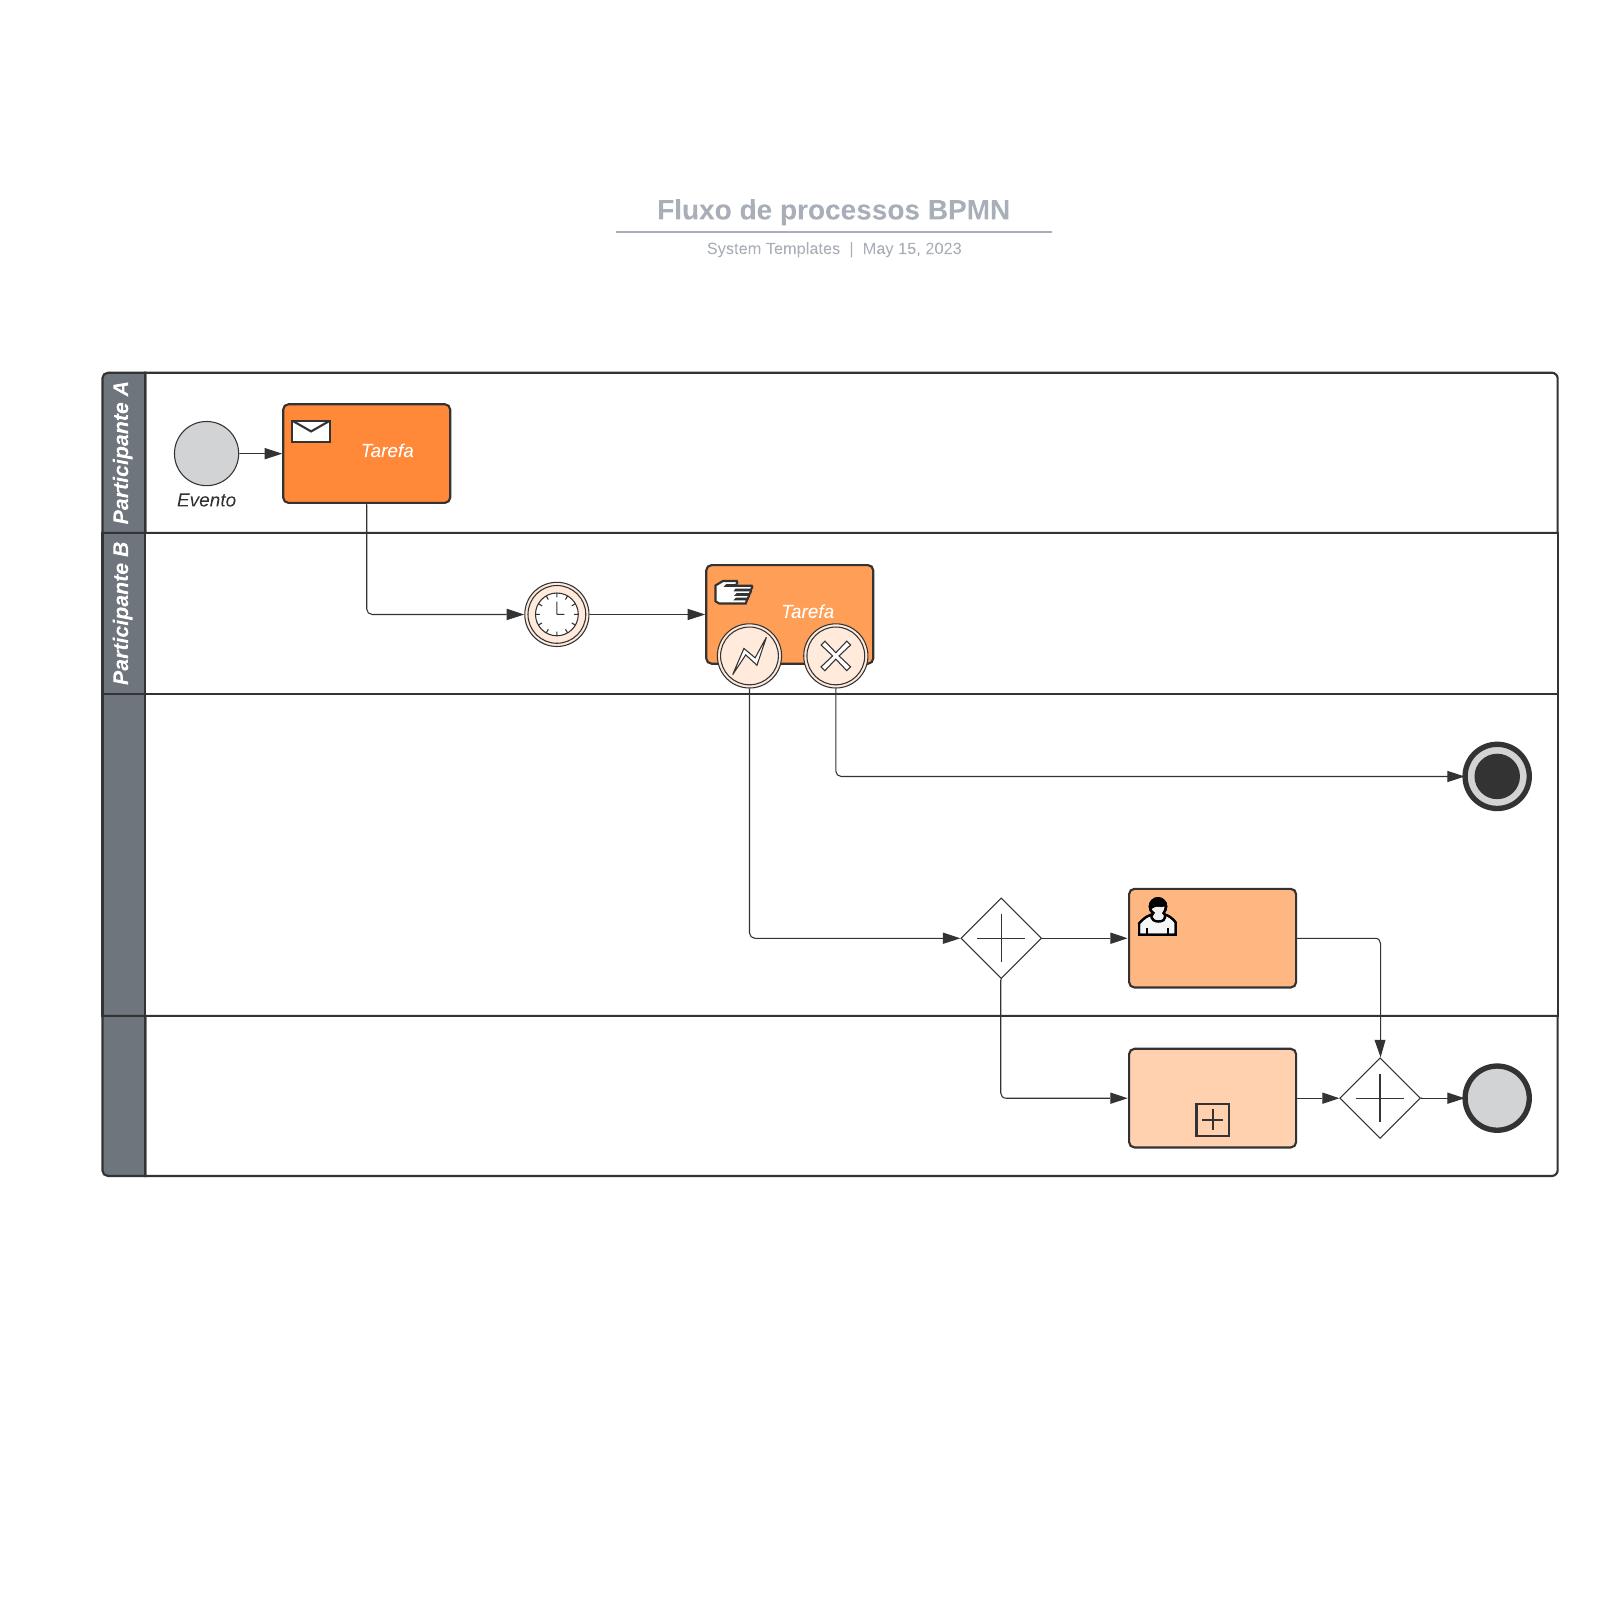 Fluxo de processos BPMN